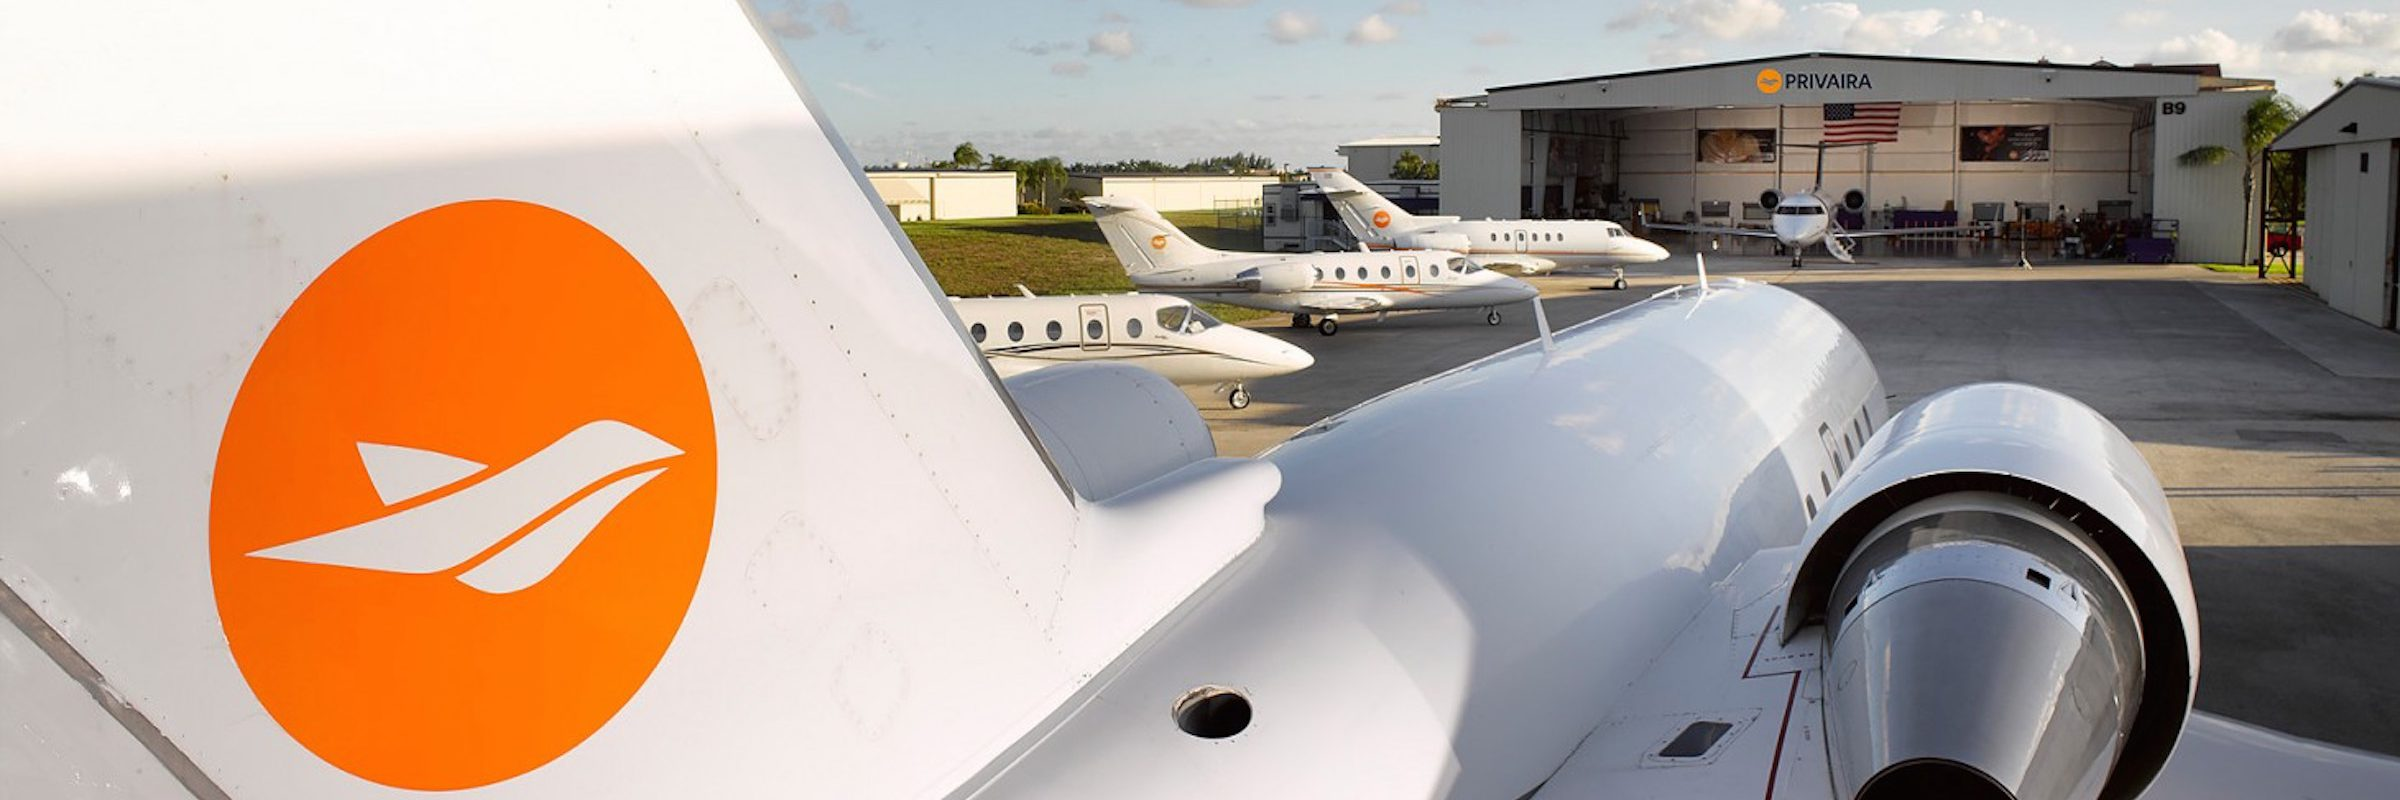 Boca Raton Airport Hangar Privaira